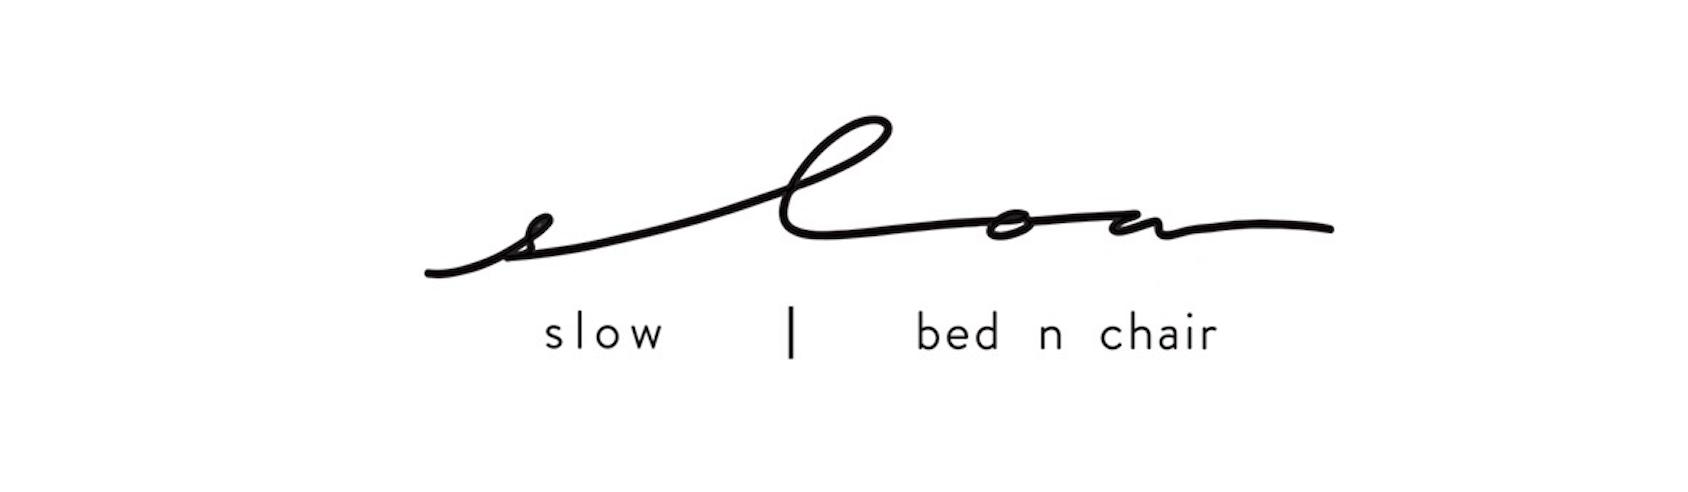 slow bed n chair